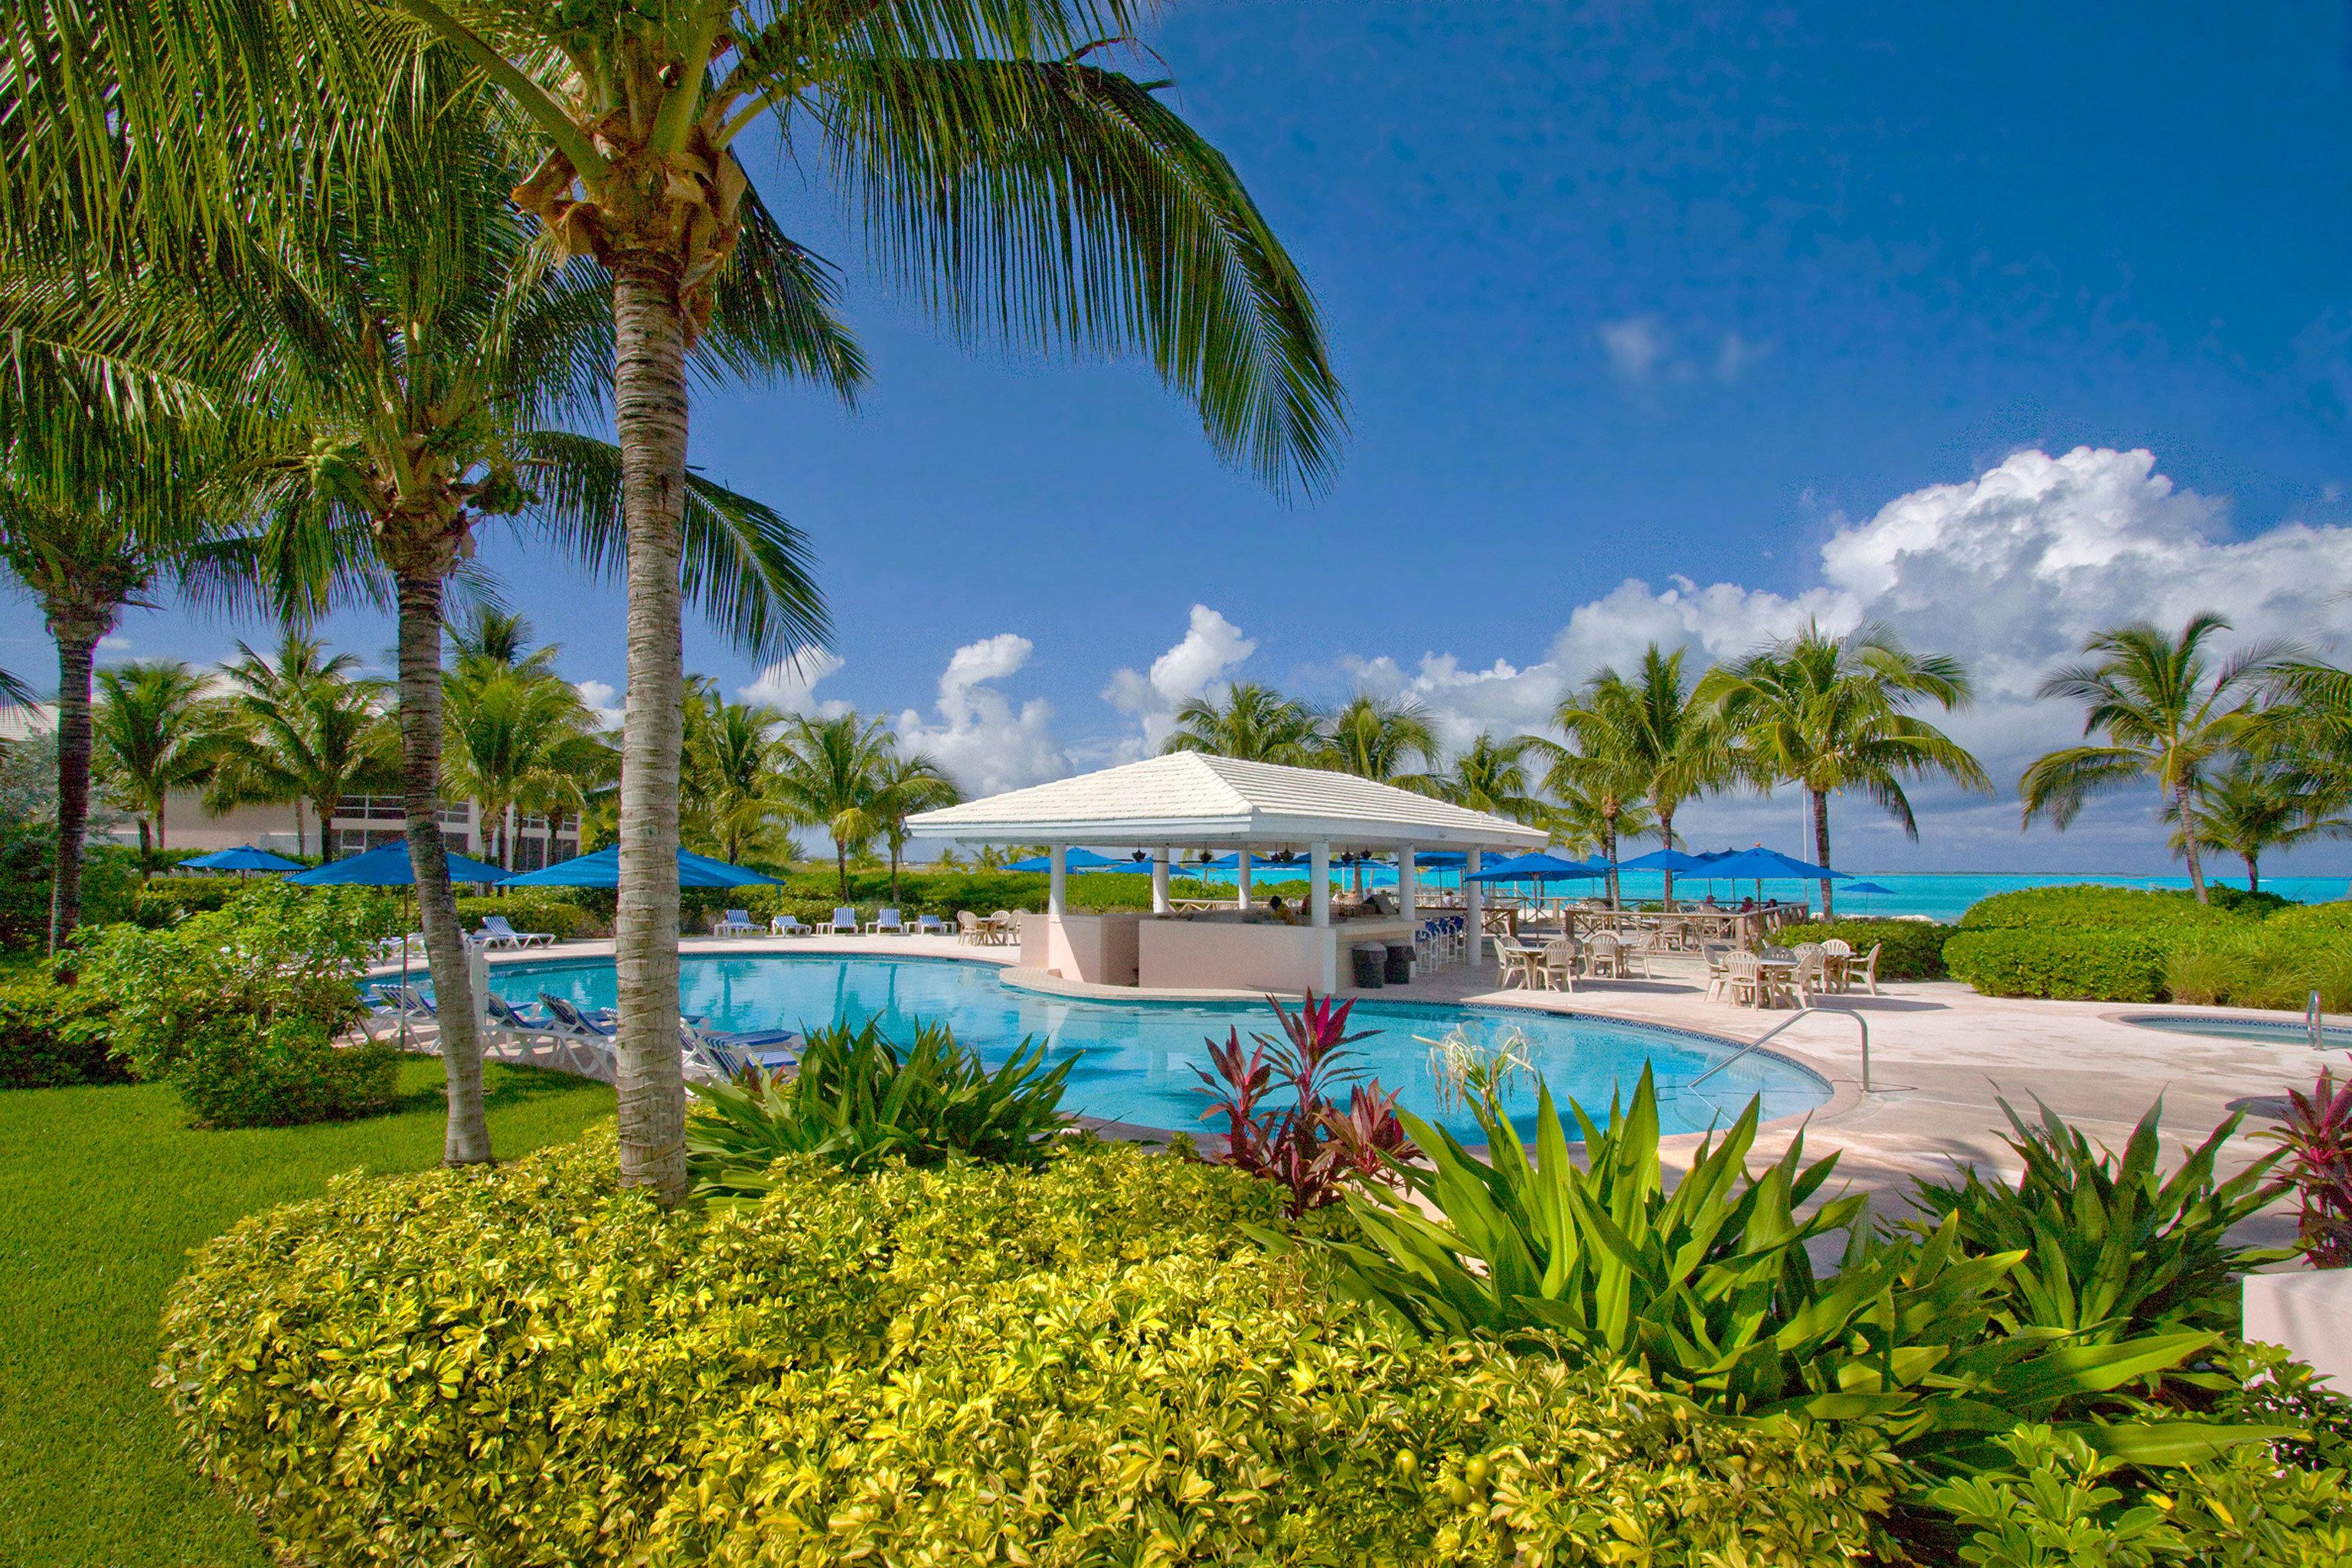 Beachfront Grounds Play Pool Resort tree grass property palm caribbean Beach swimming pool arecales plant Lagoon tropics Villa lawn Garden shore